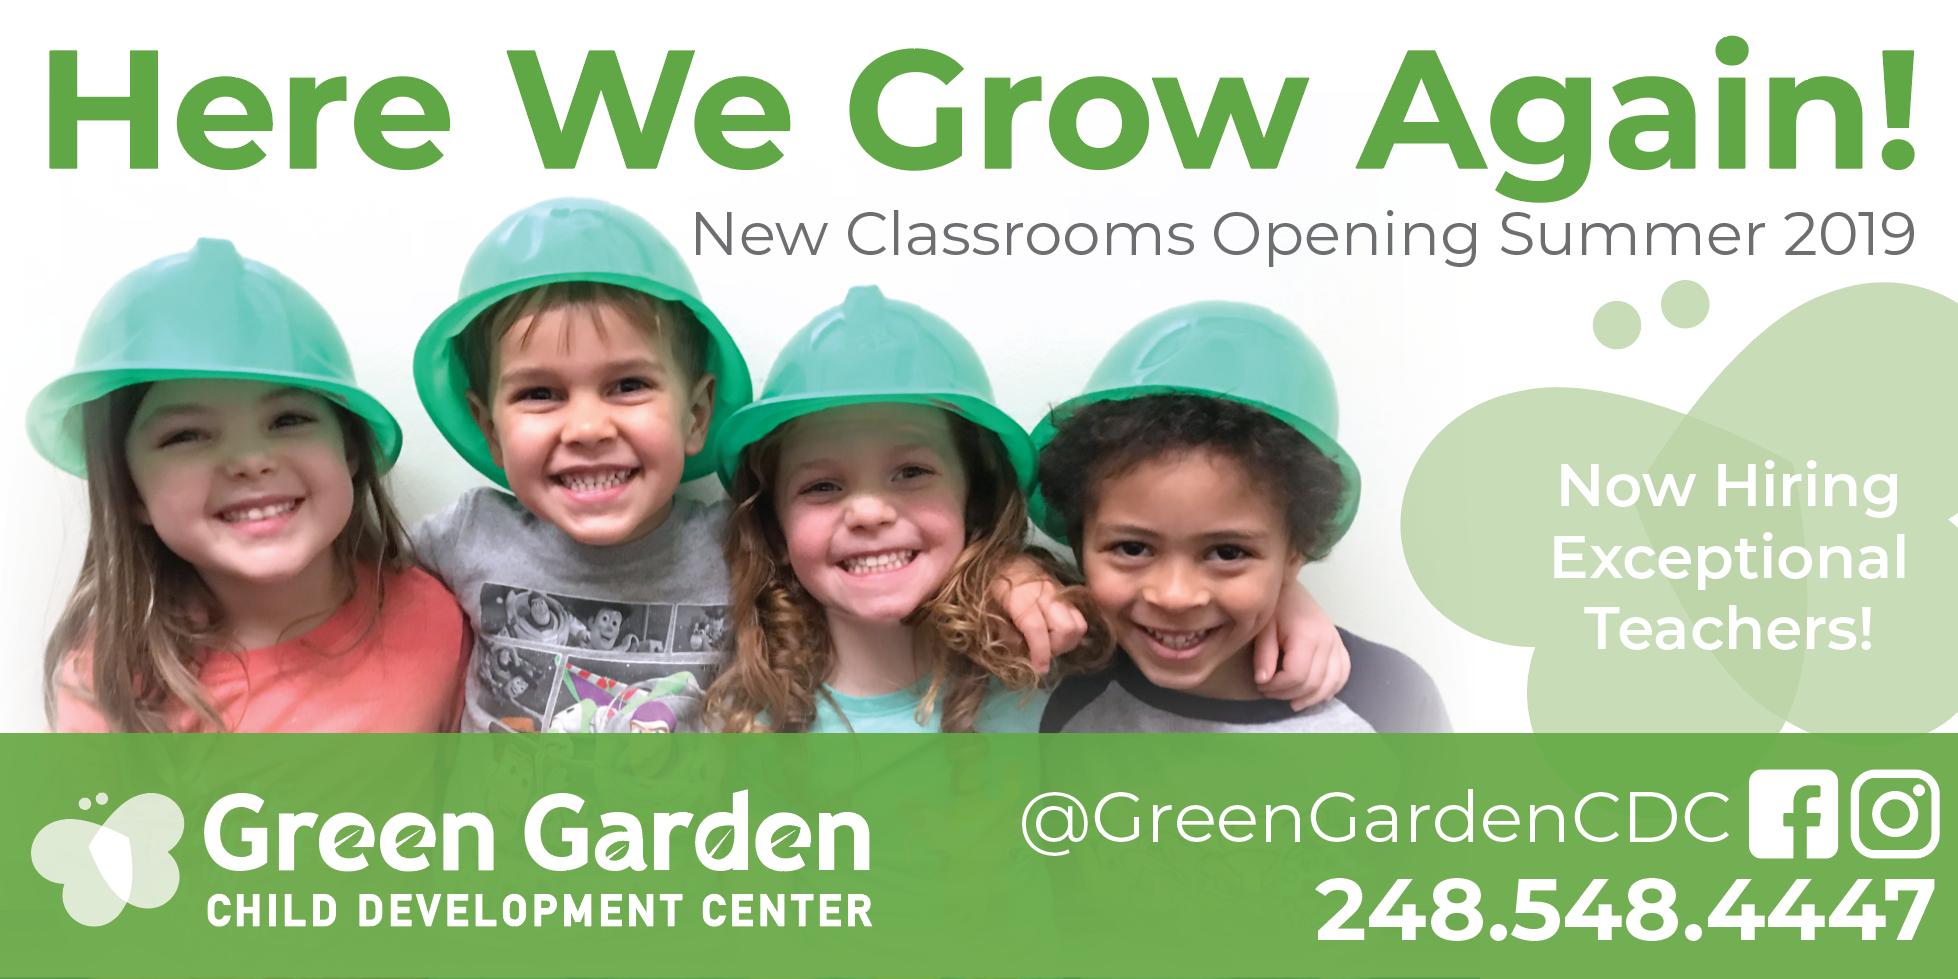 Green Garden Child Development Center - Banner Design